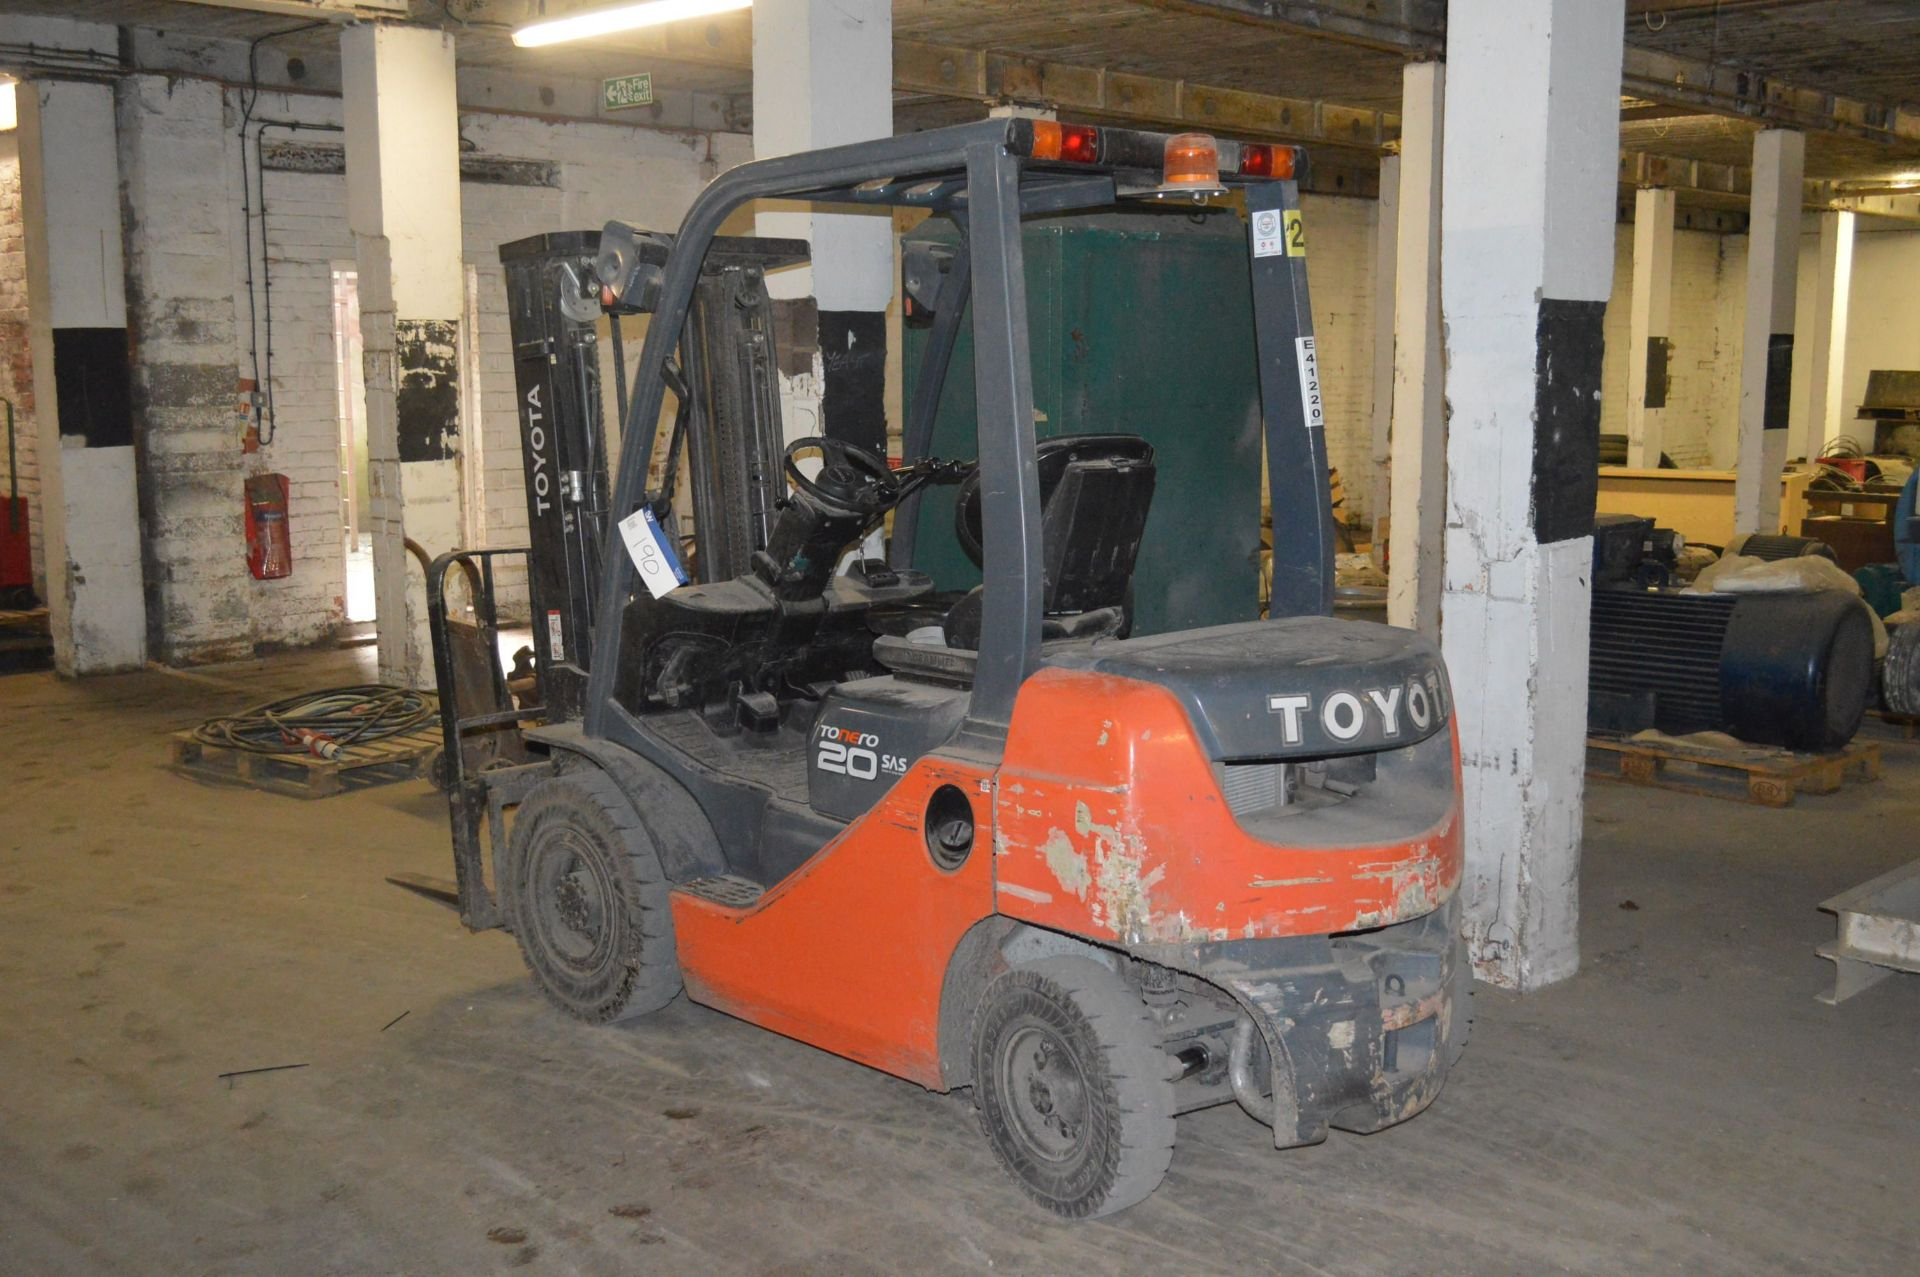 Lot 190 - Toyota 02/8FDF20 TONERO 20 SAS 2000kg cap. DIESEL FORK LIFT TRUCK, serial no. 8FDF25 FSV E911,